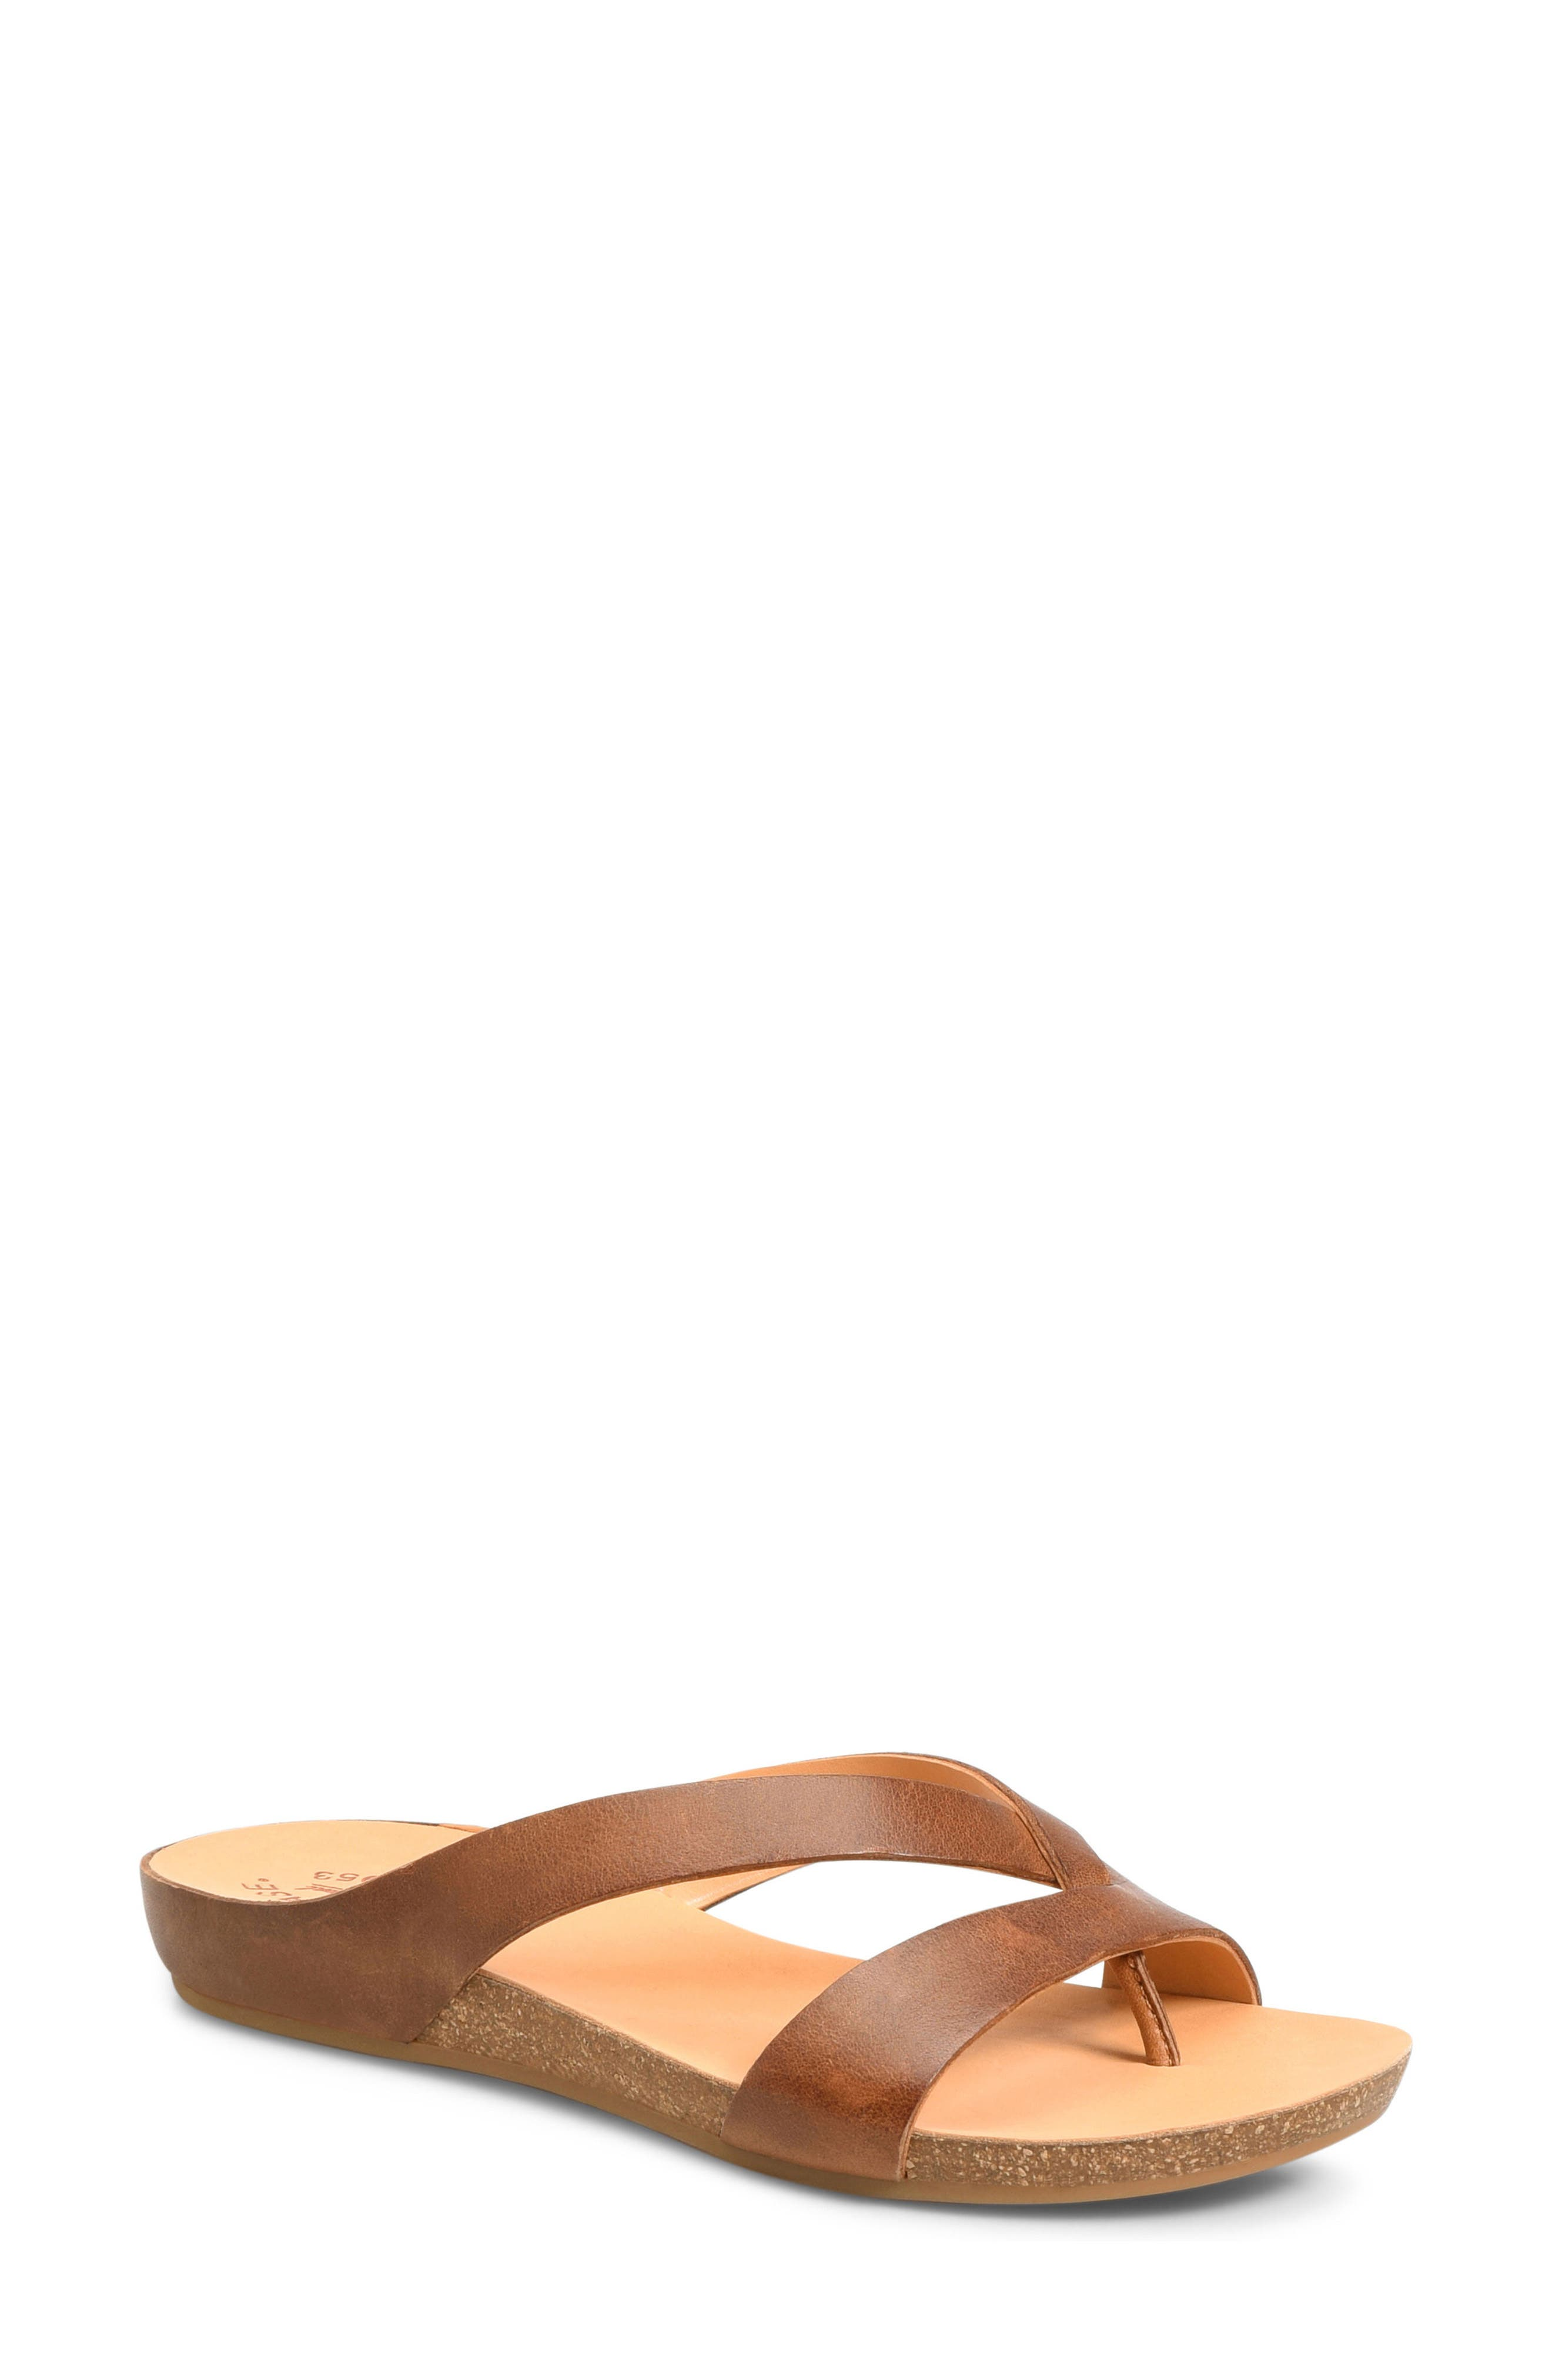 Devoe Sandal,                             Main thumbnail 1, color,                             Brown Leather